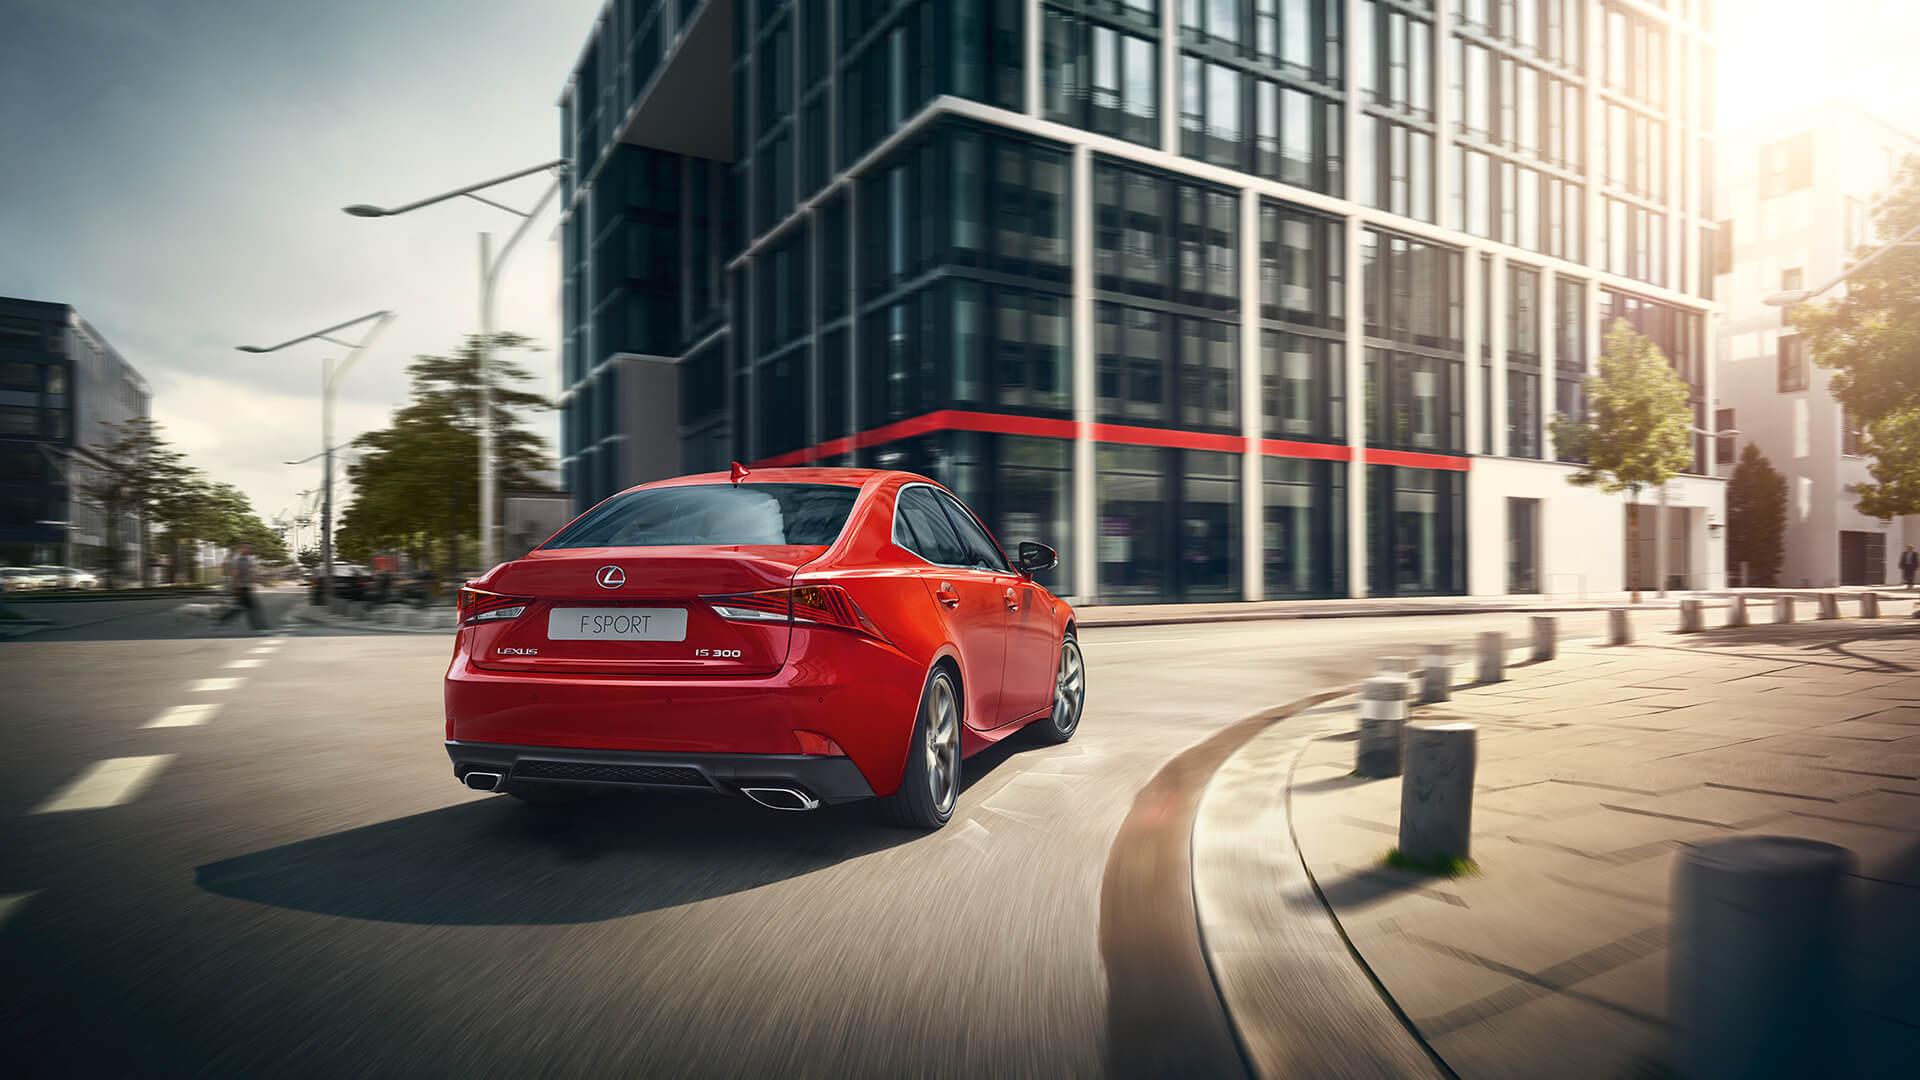 Lexus IS rot fahrend in Stadt